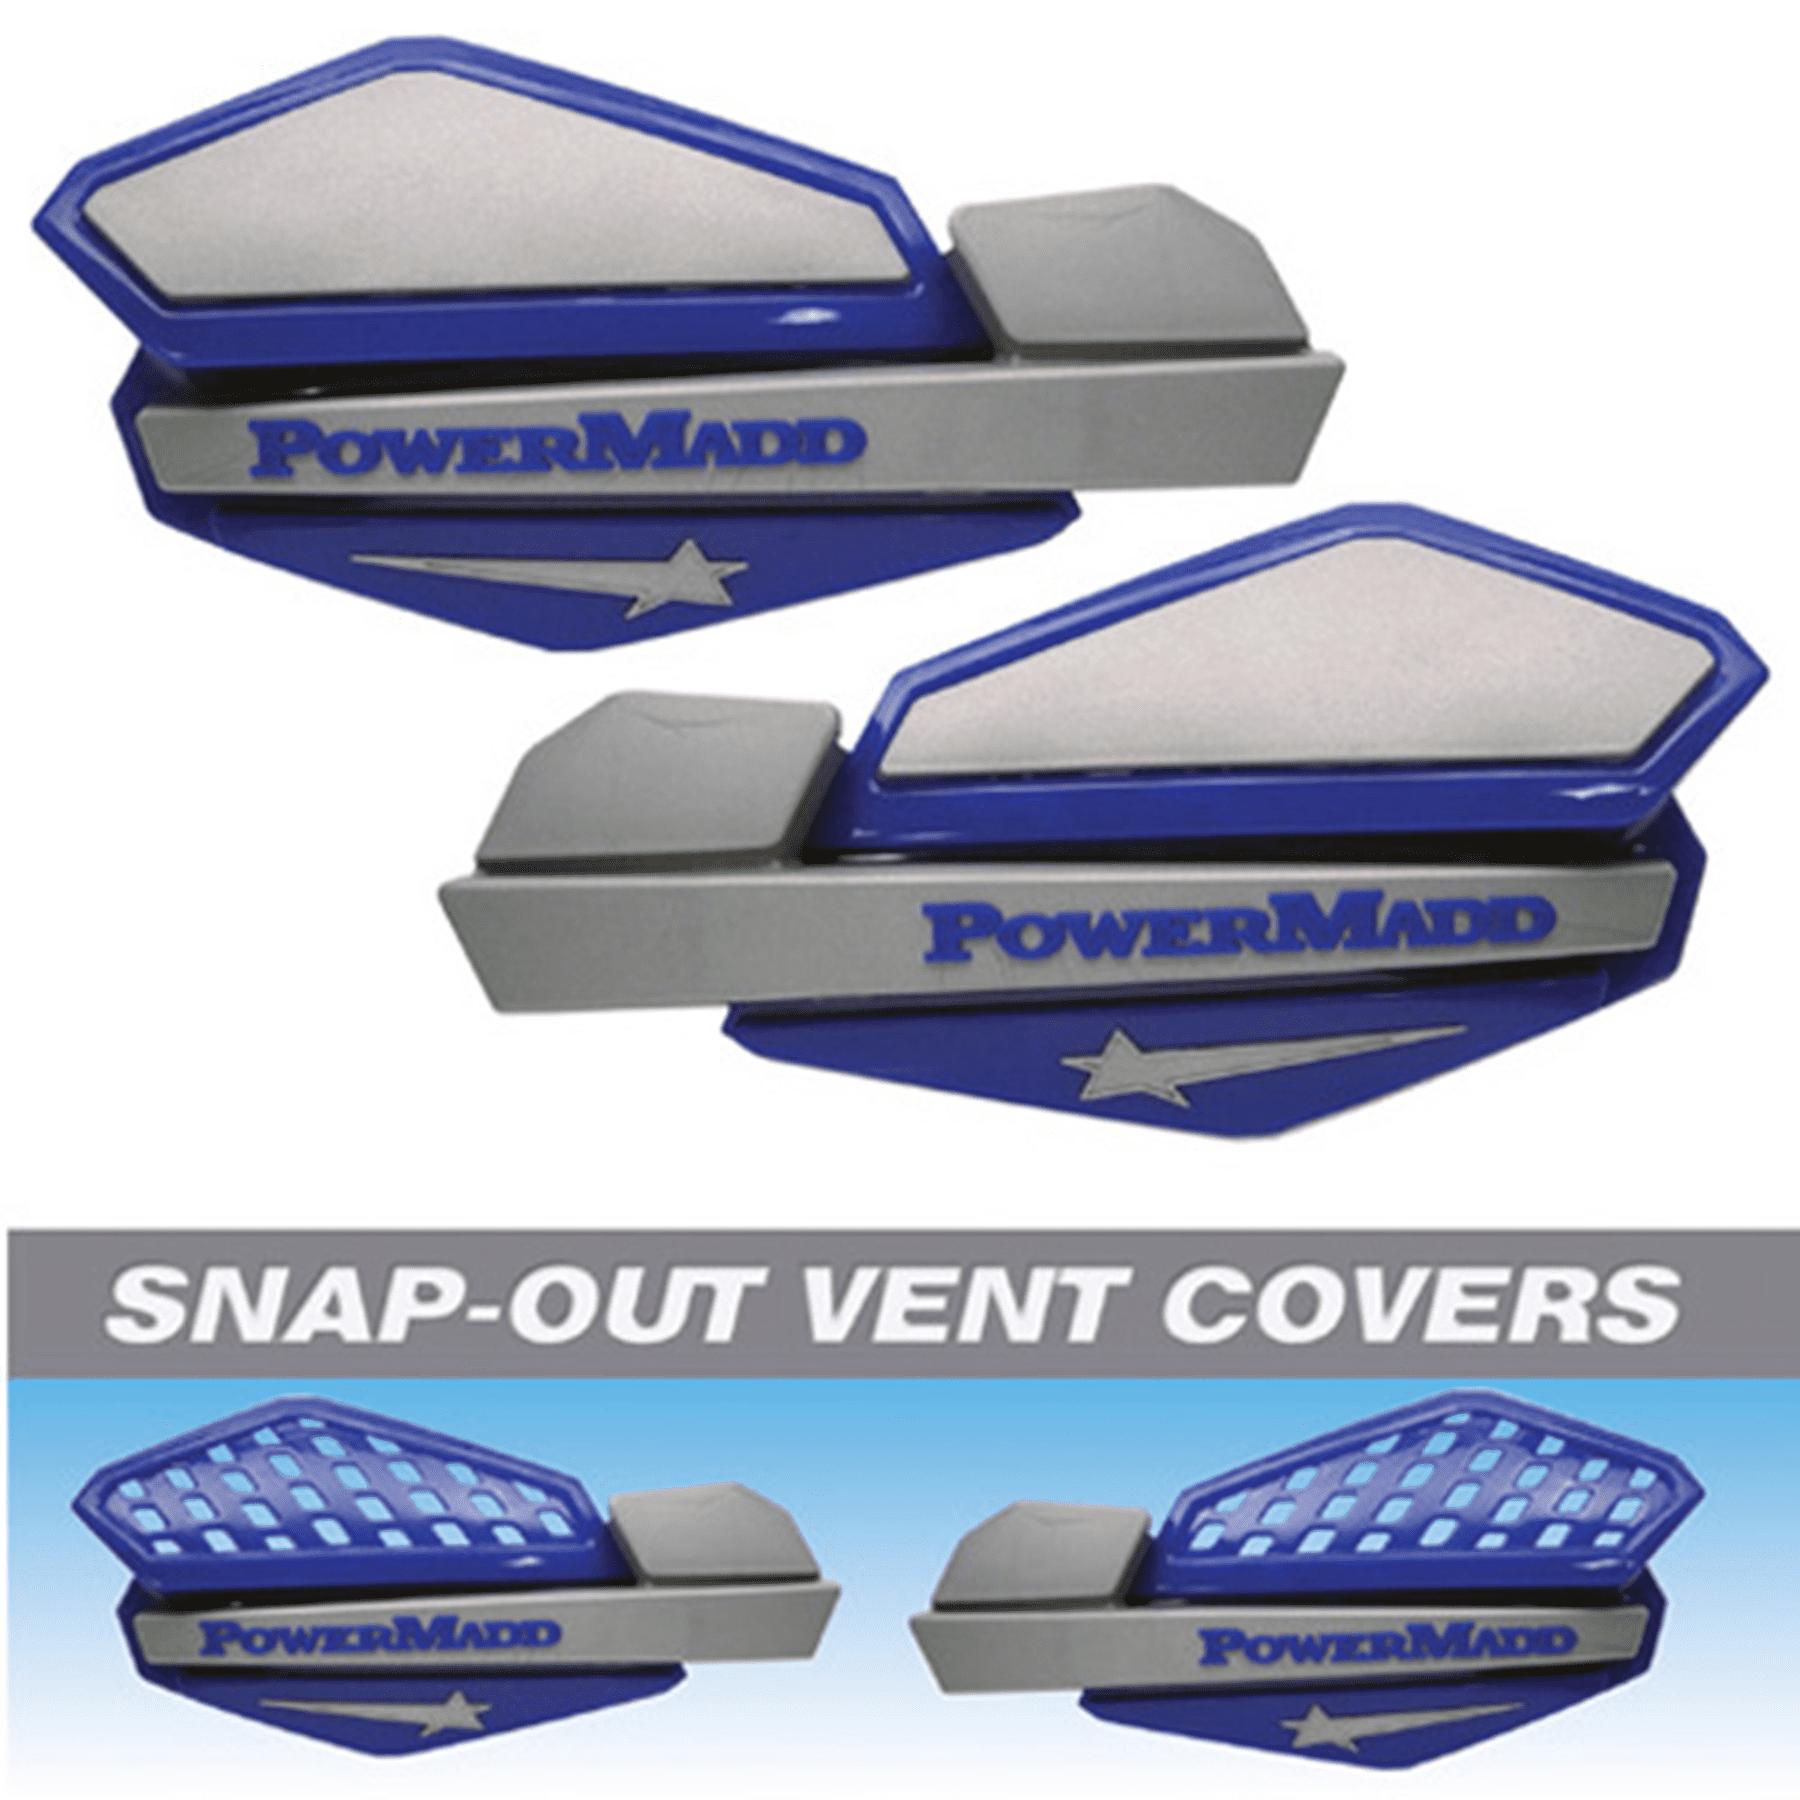 POWERMADD STAR HANDGUARD SYSTEM - BLUE/SILVER